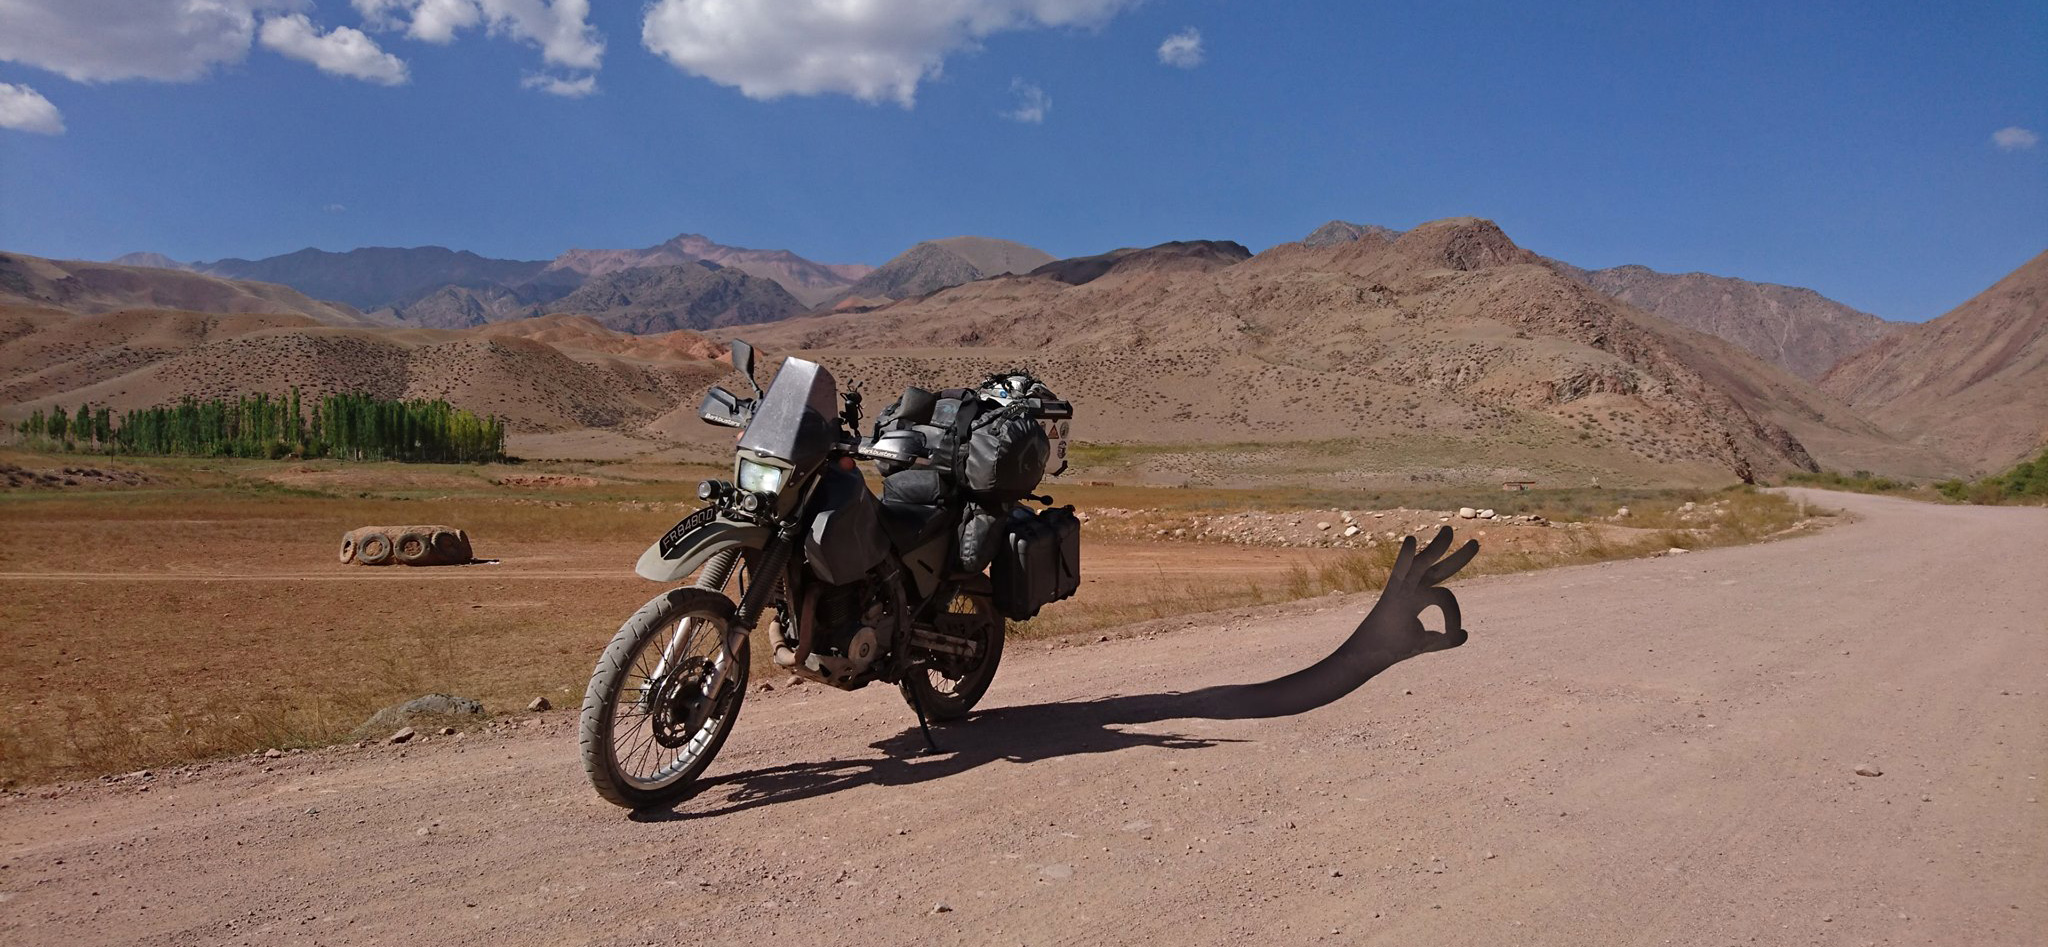 Kazakhstan dr650 motorcycle adventure